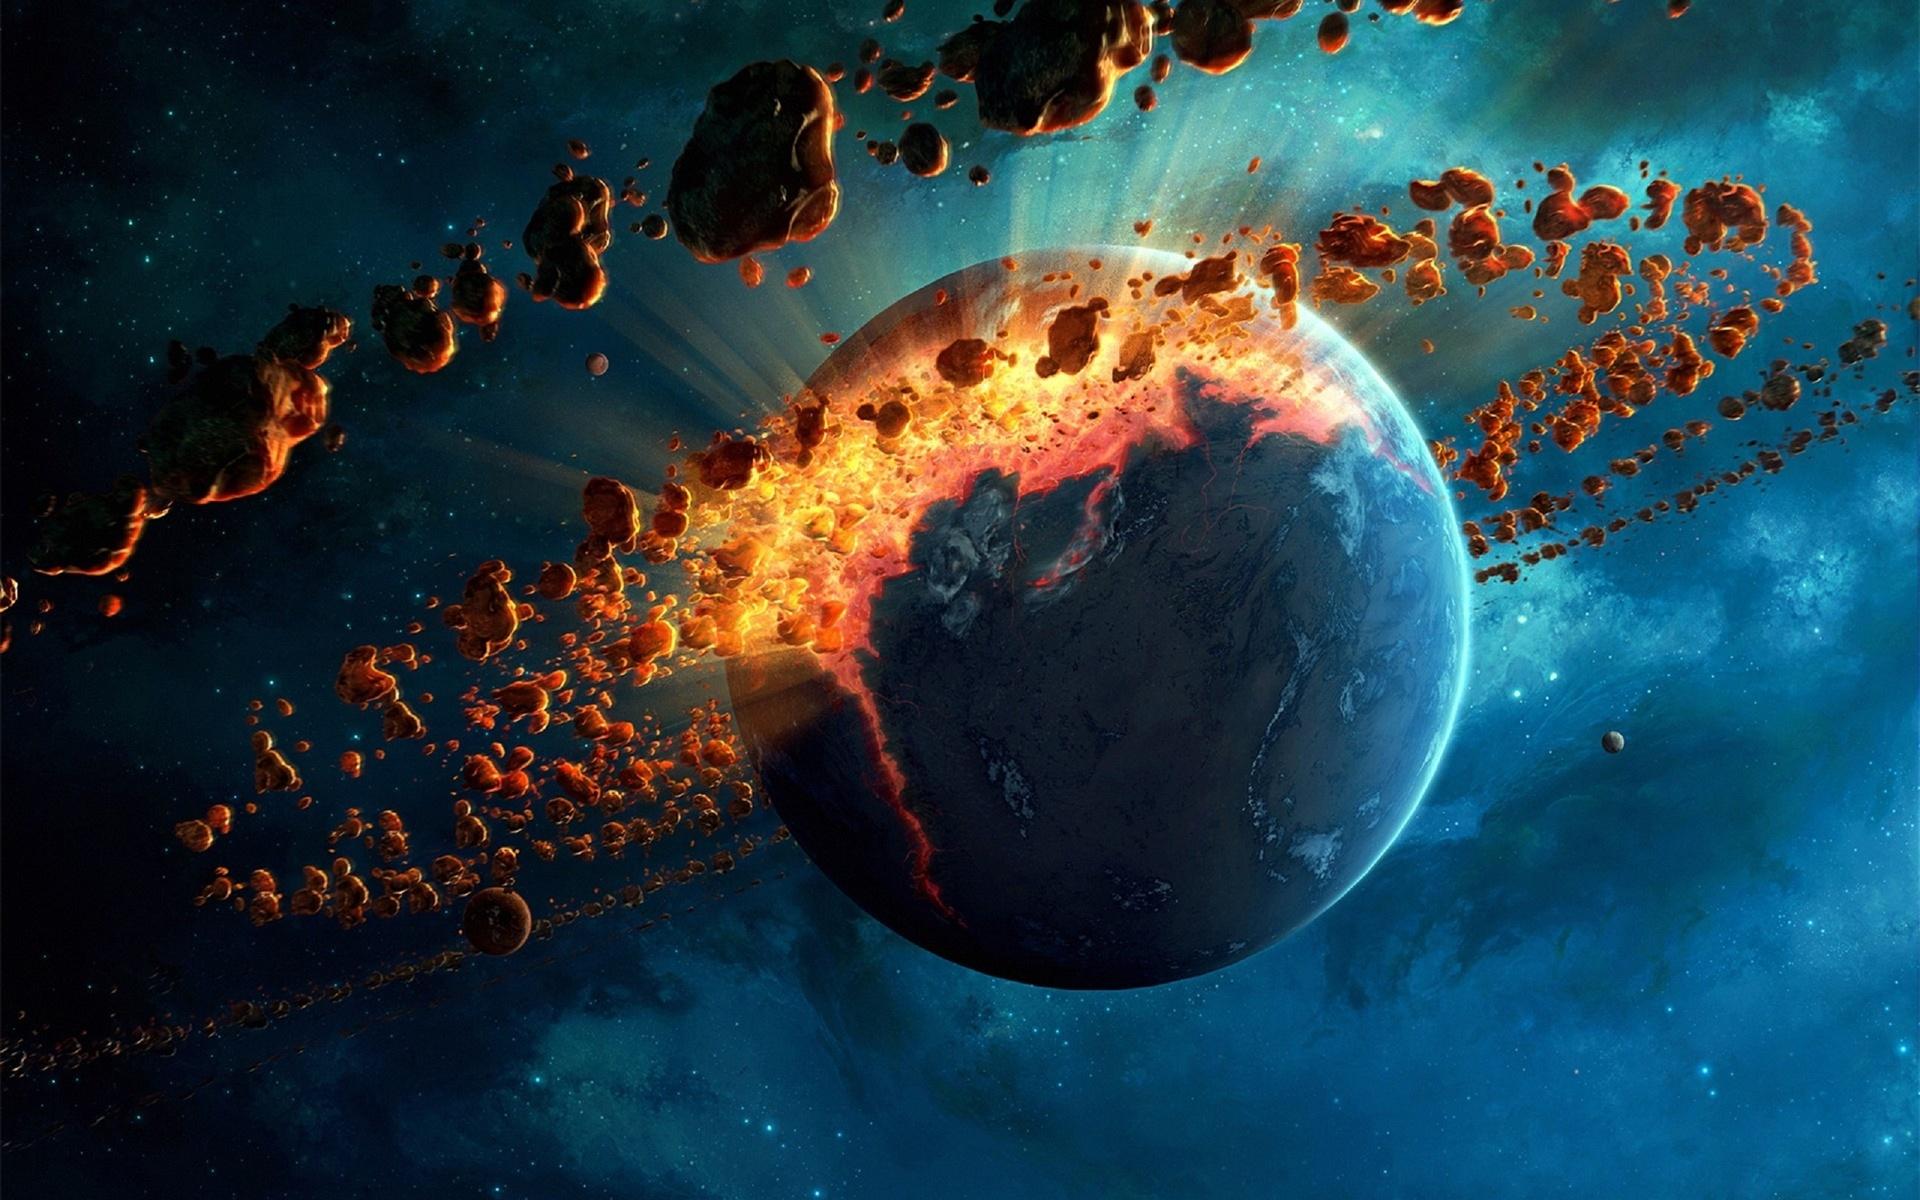 Космос картинки столкновение